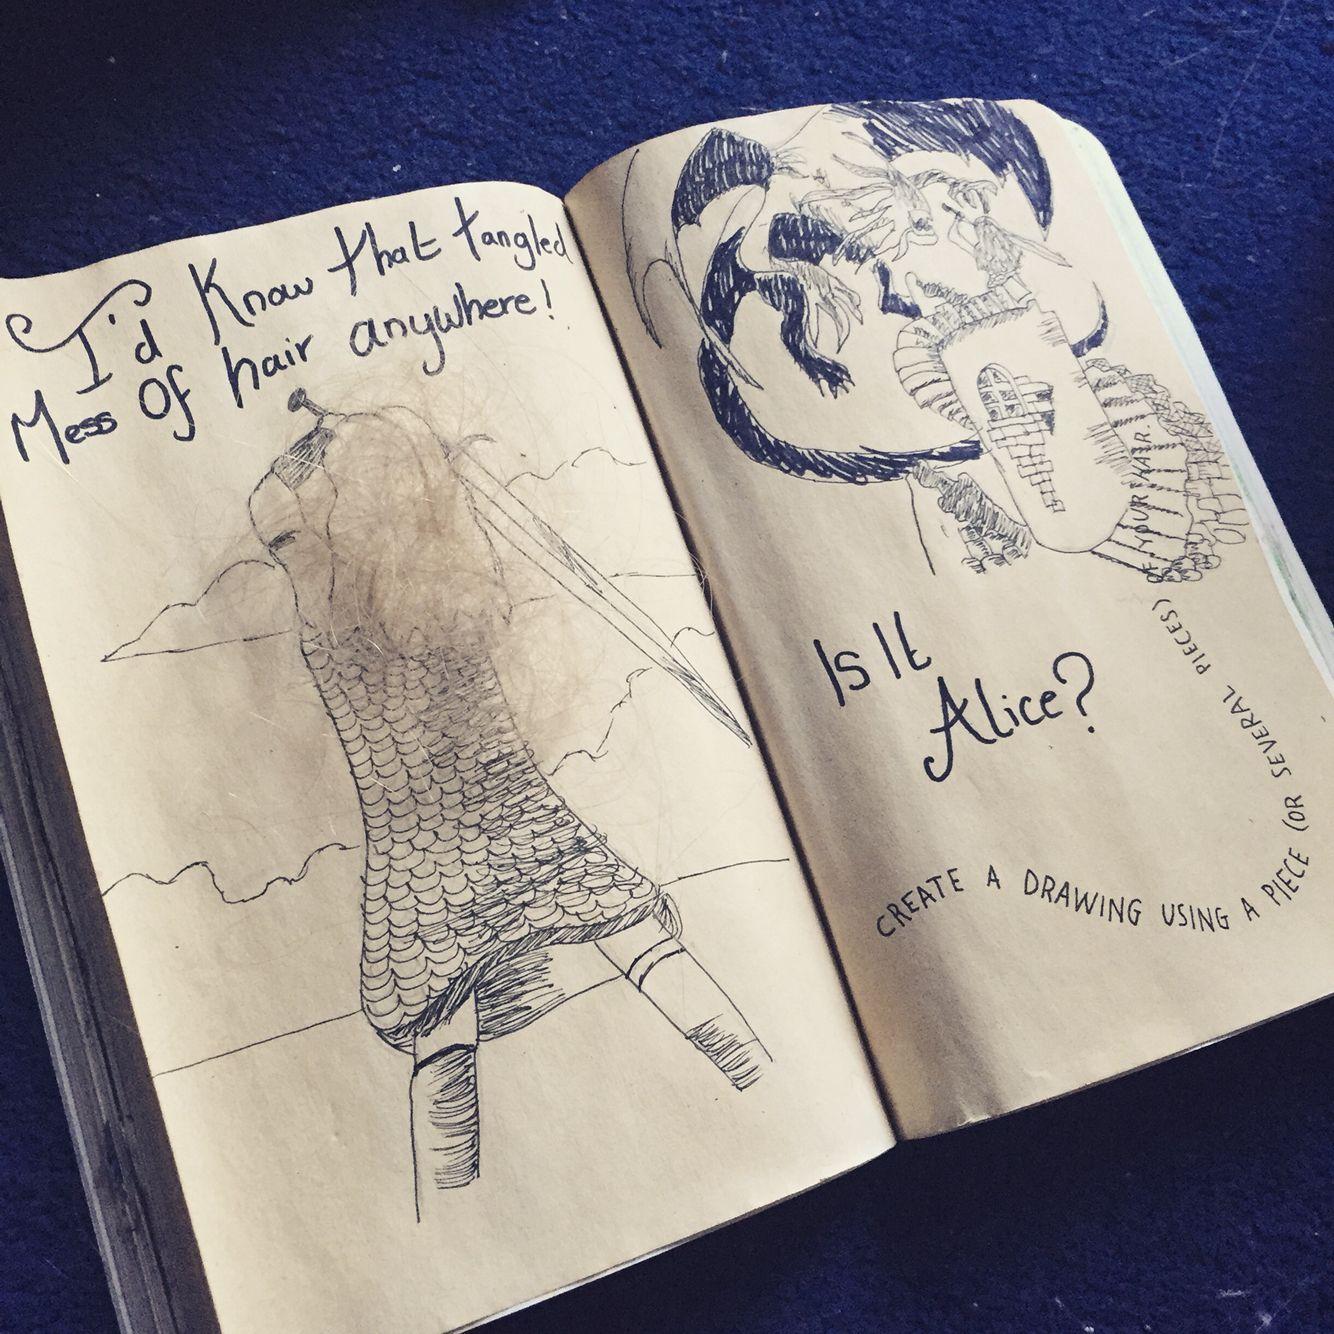 #wreckthisjournal #wreckbook #wreckit #kerismith #alice #wonderland #aliceinwonderland